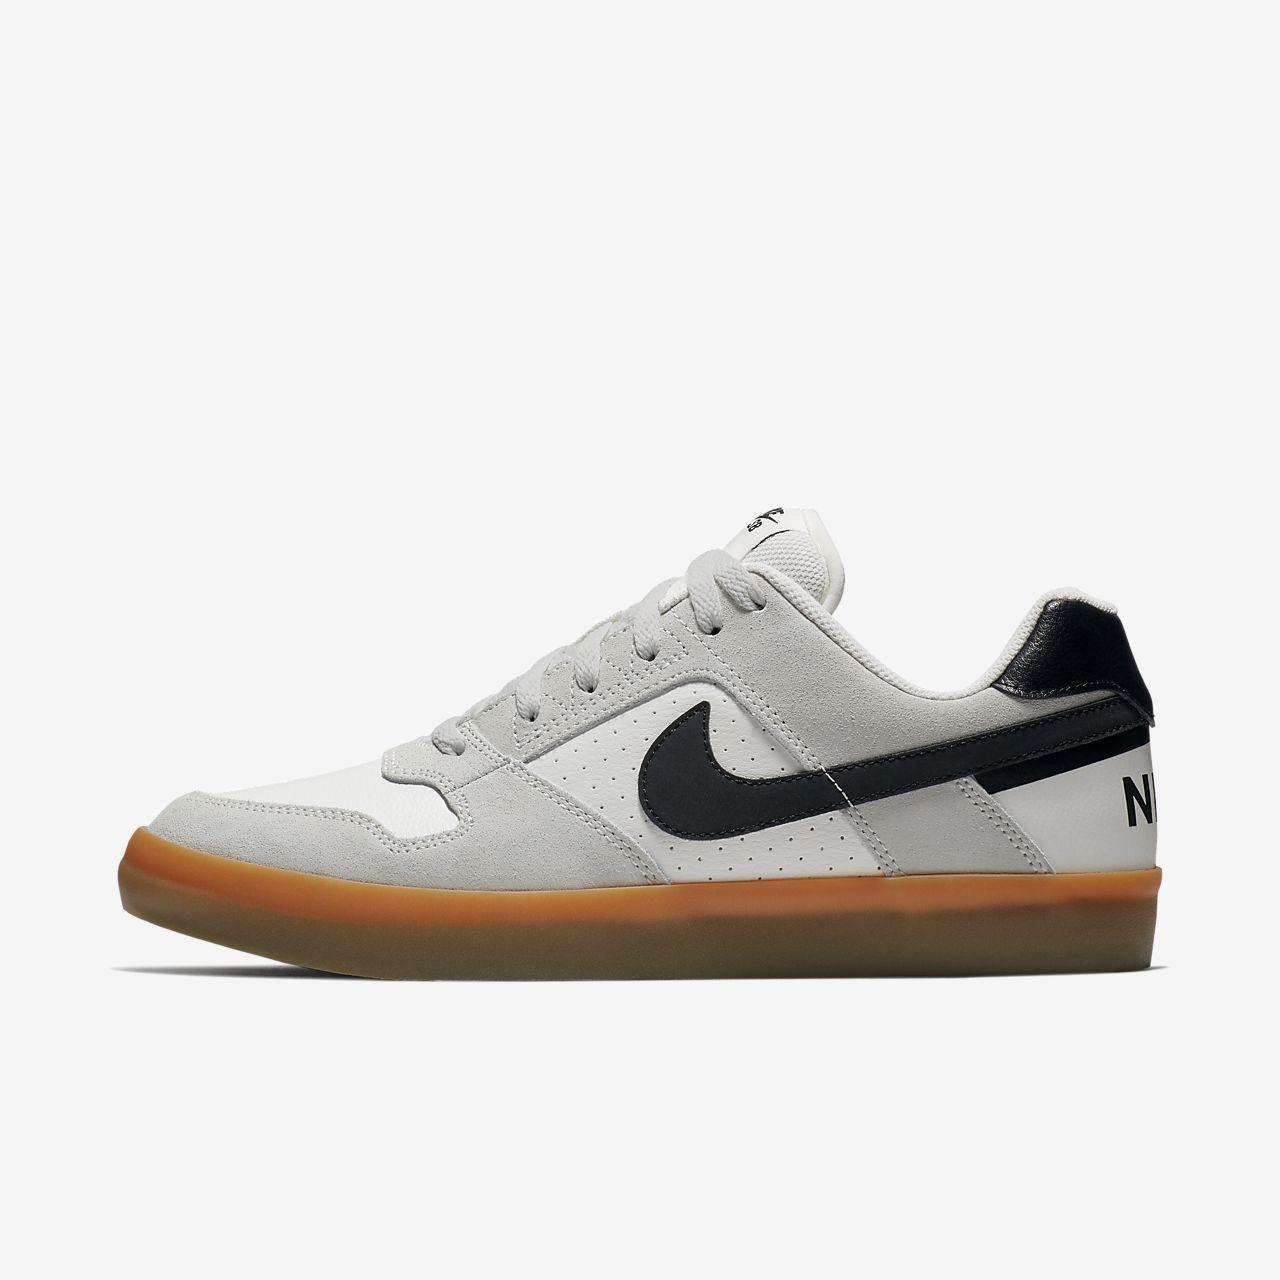 morsetto cattivo Anello rigido  Nike SB Delta Force Vulc Men's Skateboarding Shoe   Nike sb, Nike killshot, Nike  men